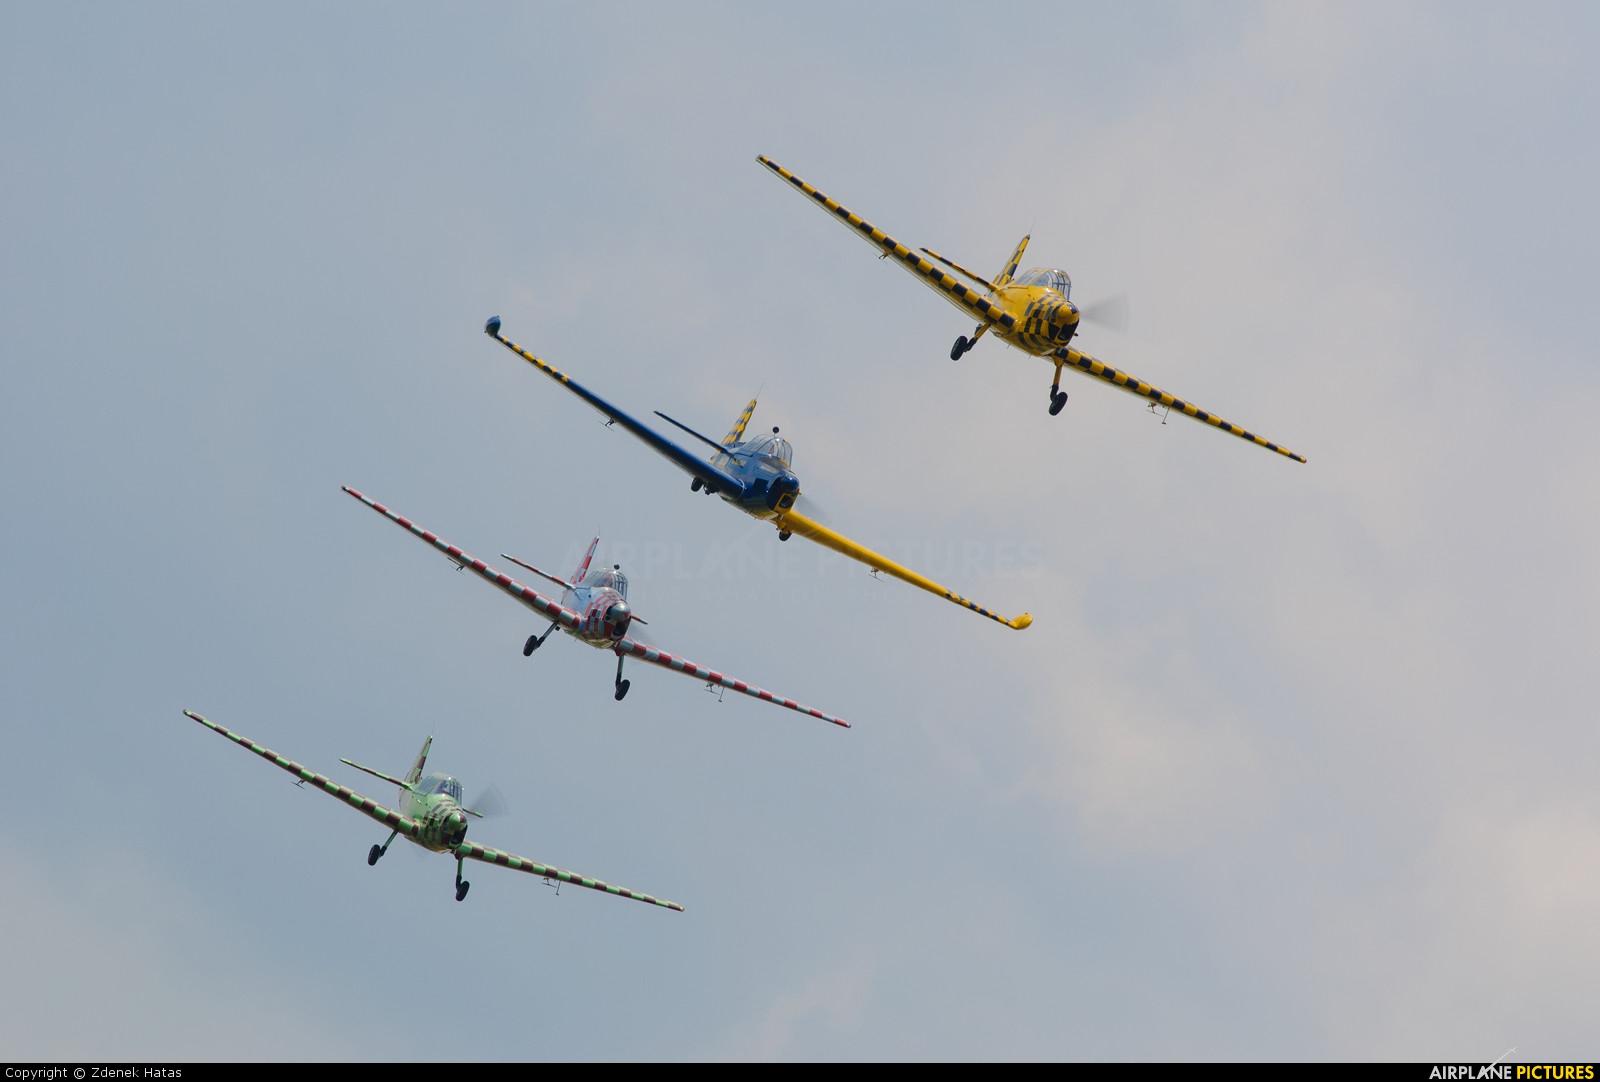 Aeroklub Czech Republic OK-KNR aircraft at Pardubice